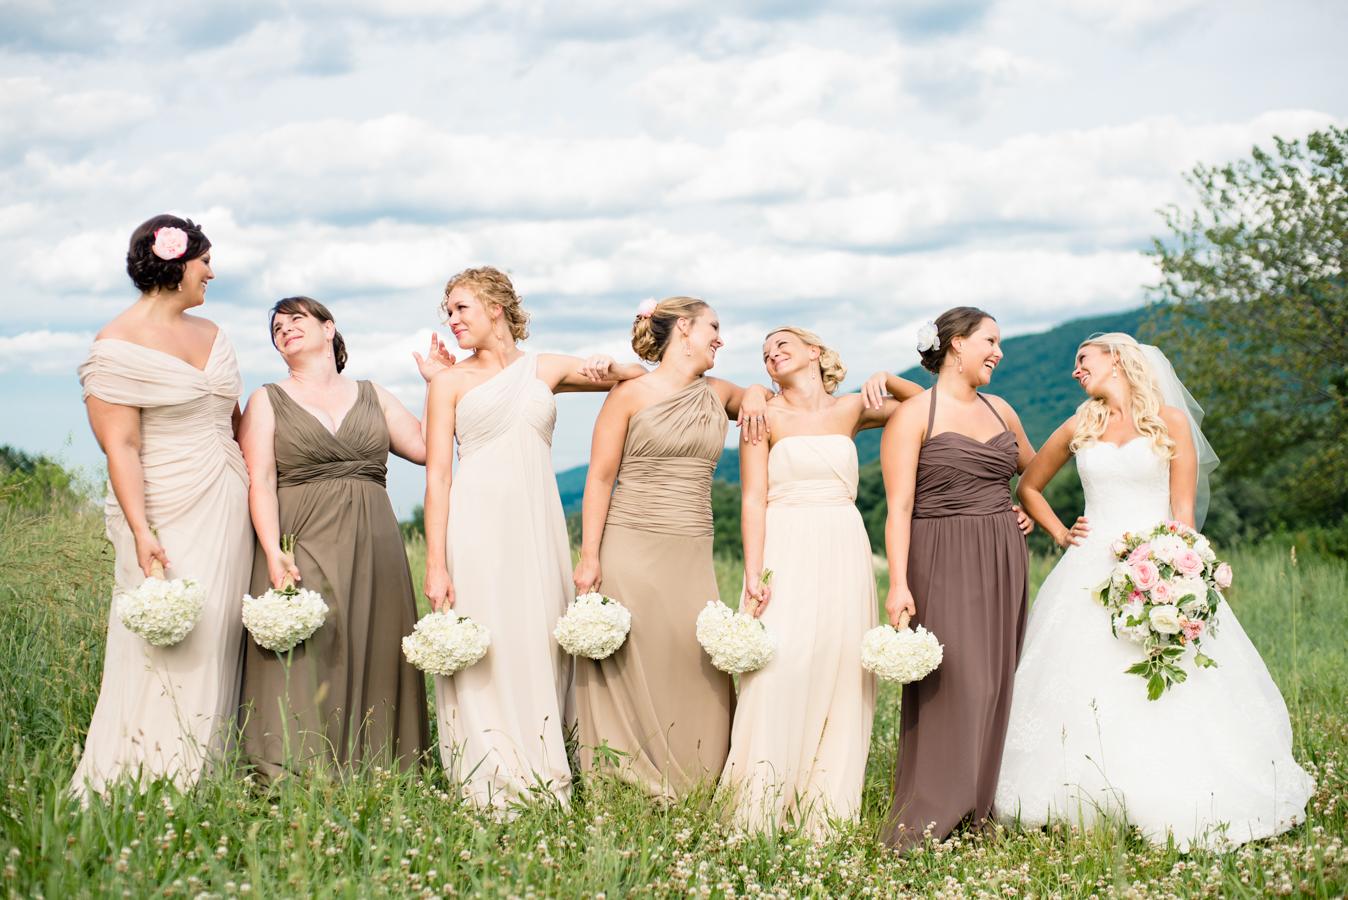 williamsport-wedding-photographers-field.jpg